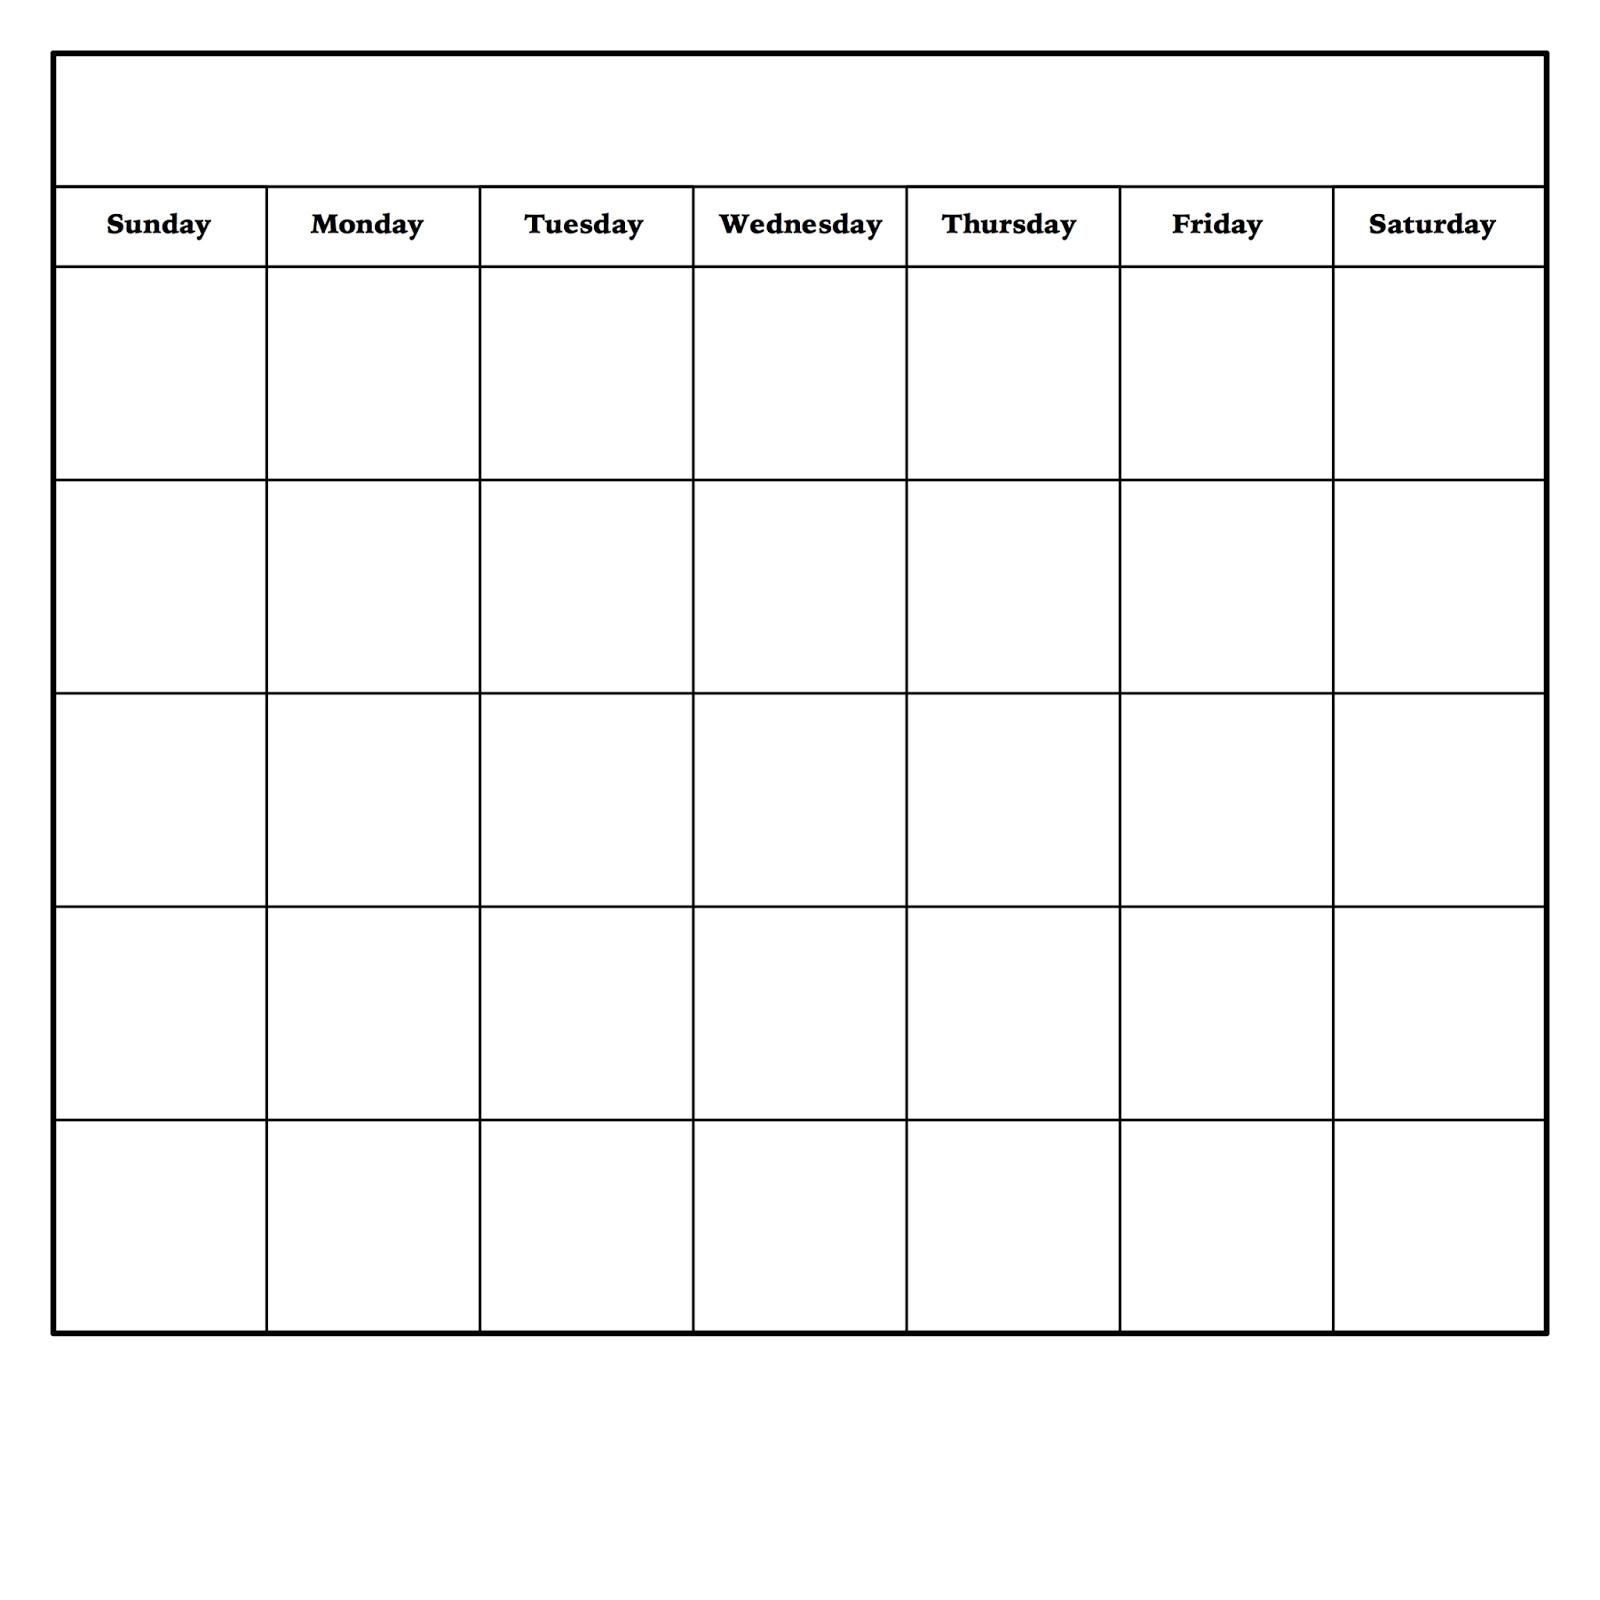 Blank Monday Through Friday Pdf   Calendar Template Printable Blank Free Printable Monday Through Friday